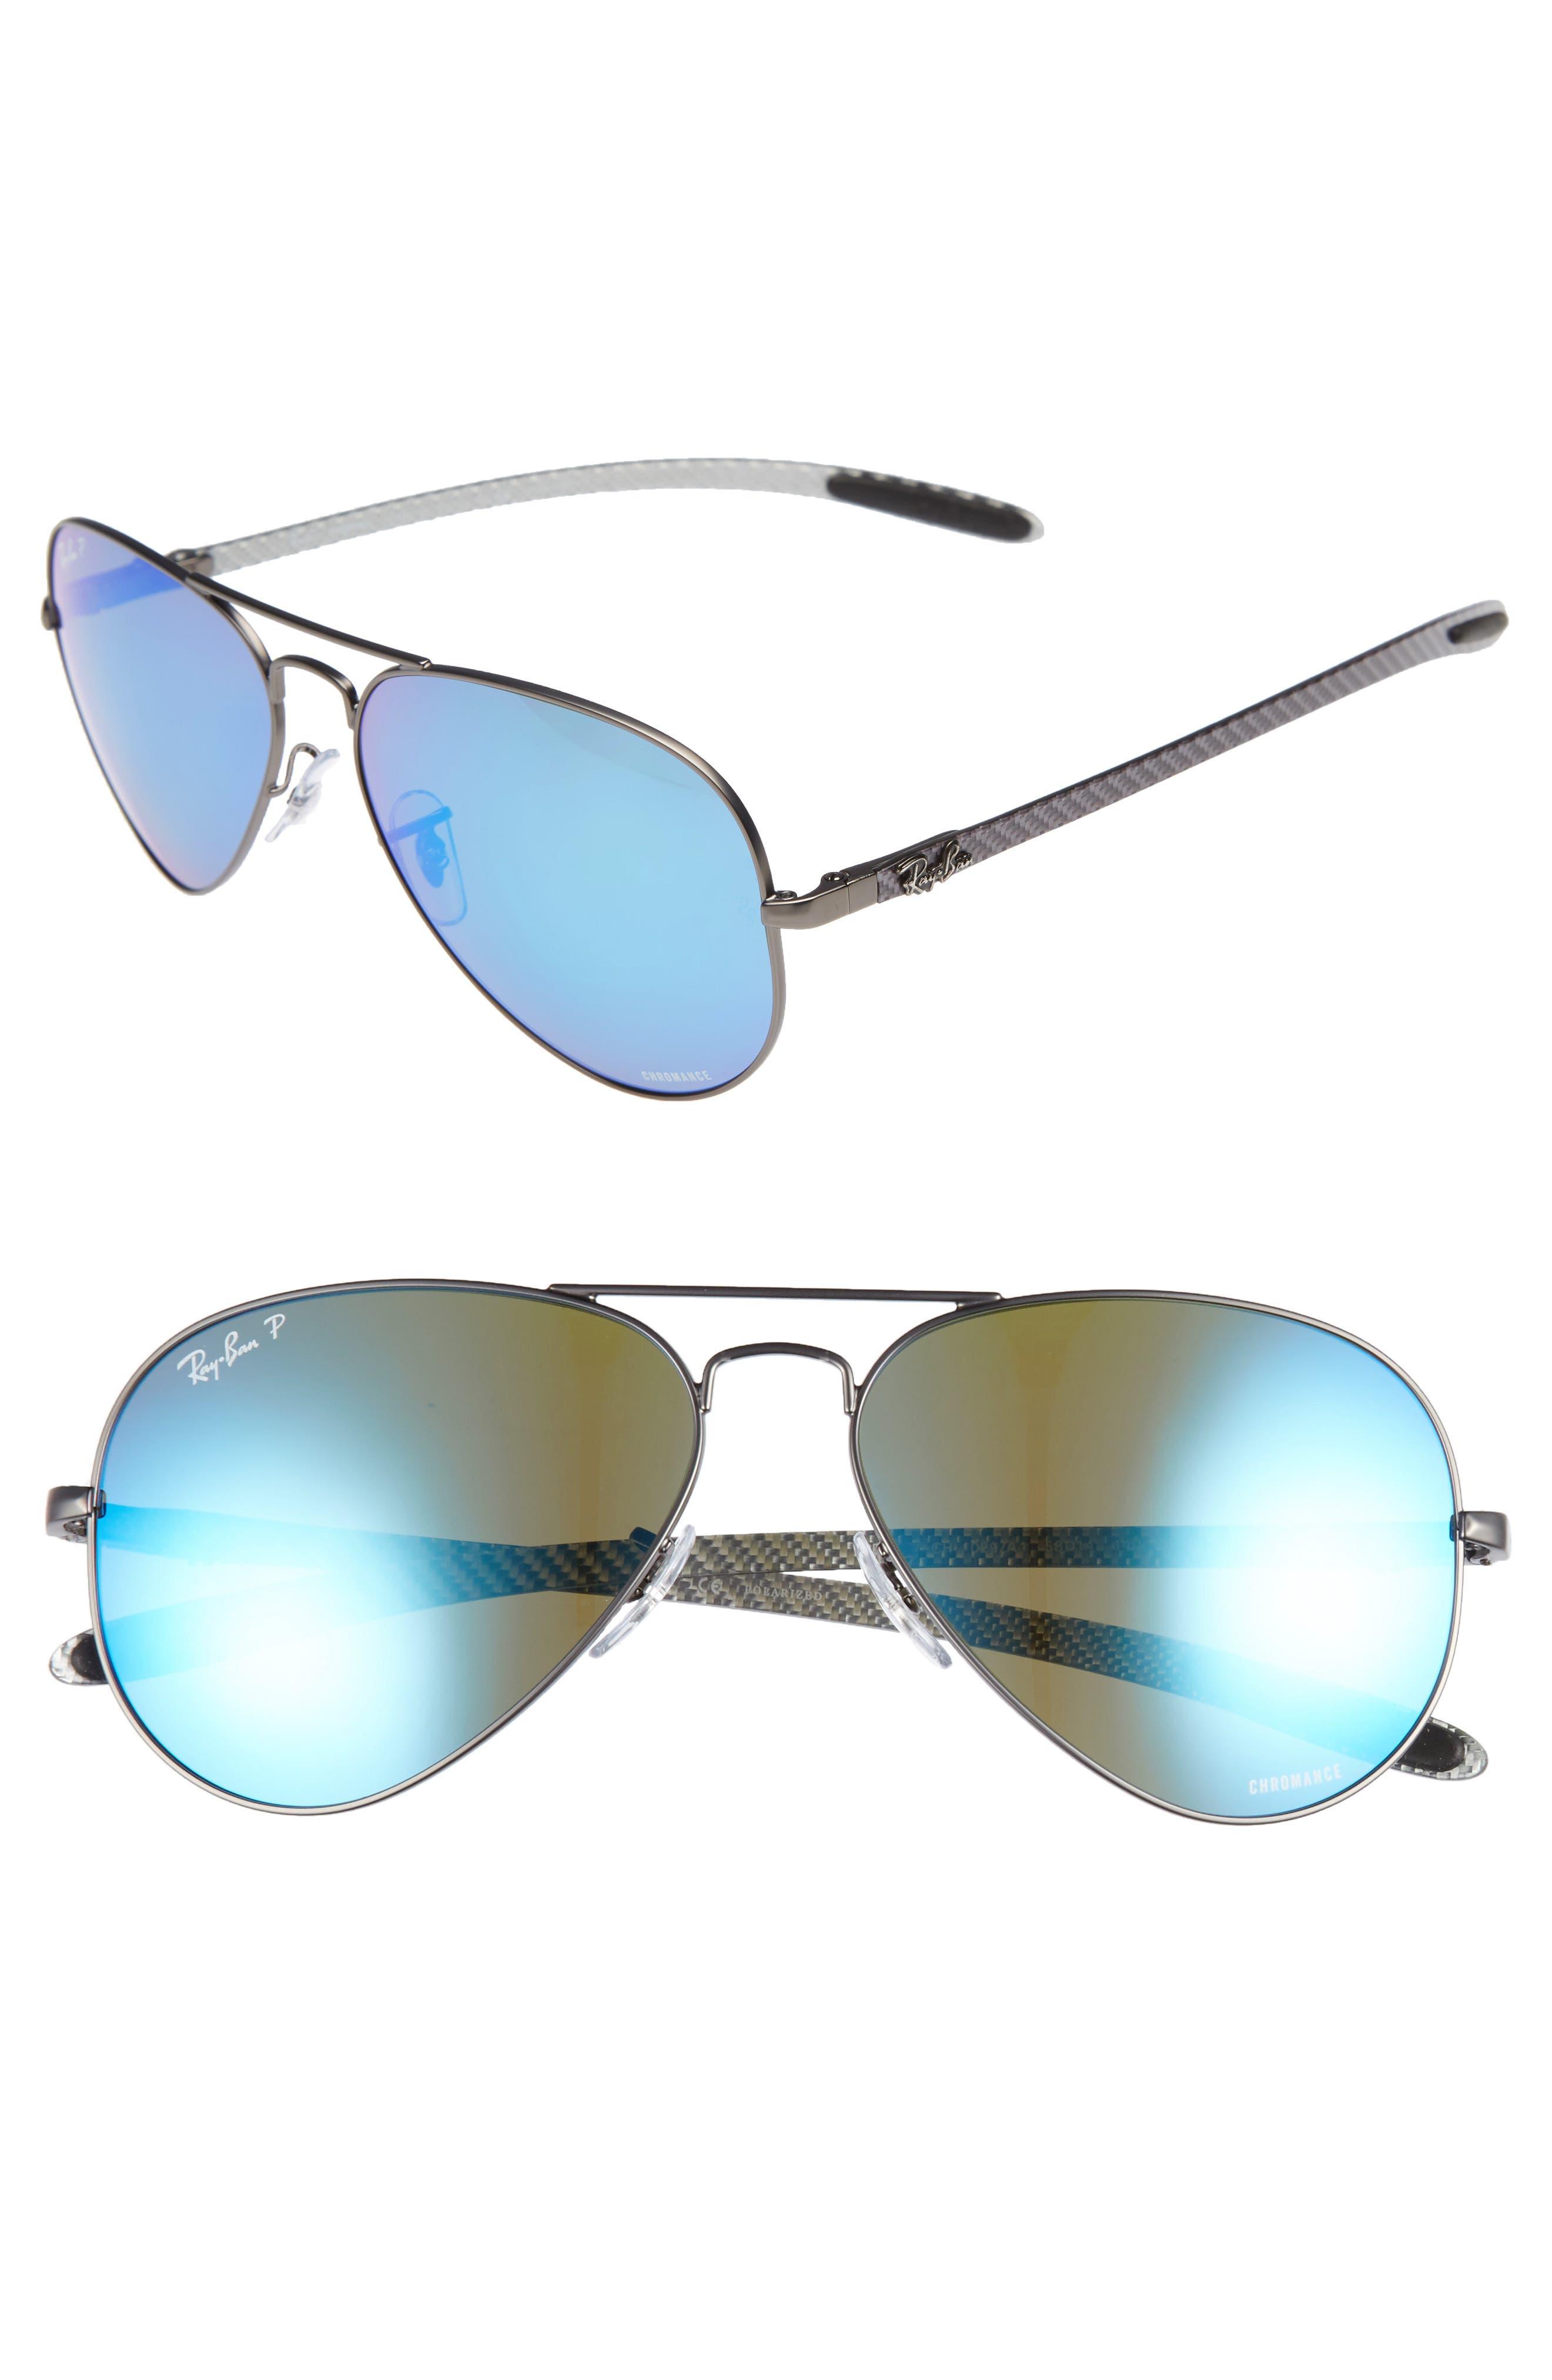 Ray-Ban Chromance 58mm Polarized Aviator Sunglasses